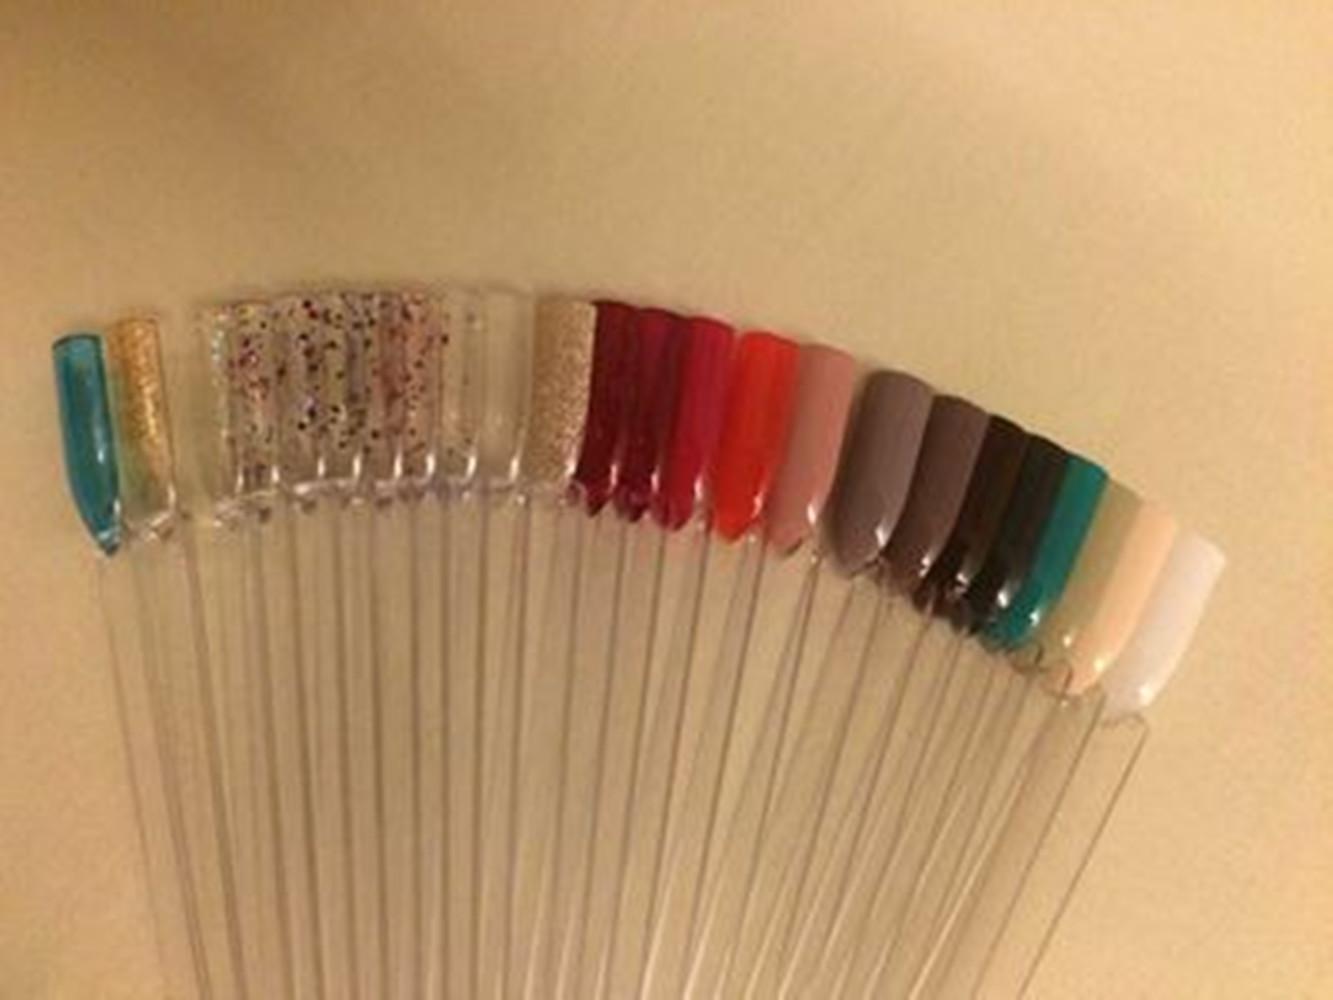 50pcs Nail Art Tips Colour Pop Sticks Display Fan Clear False